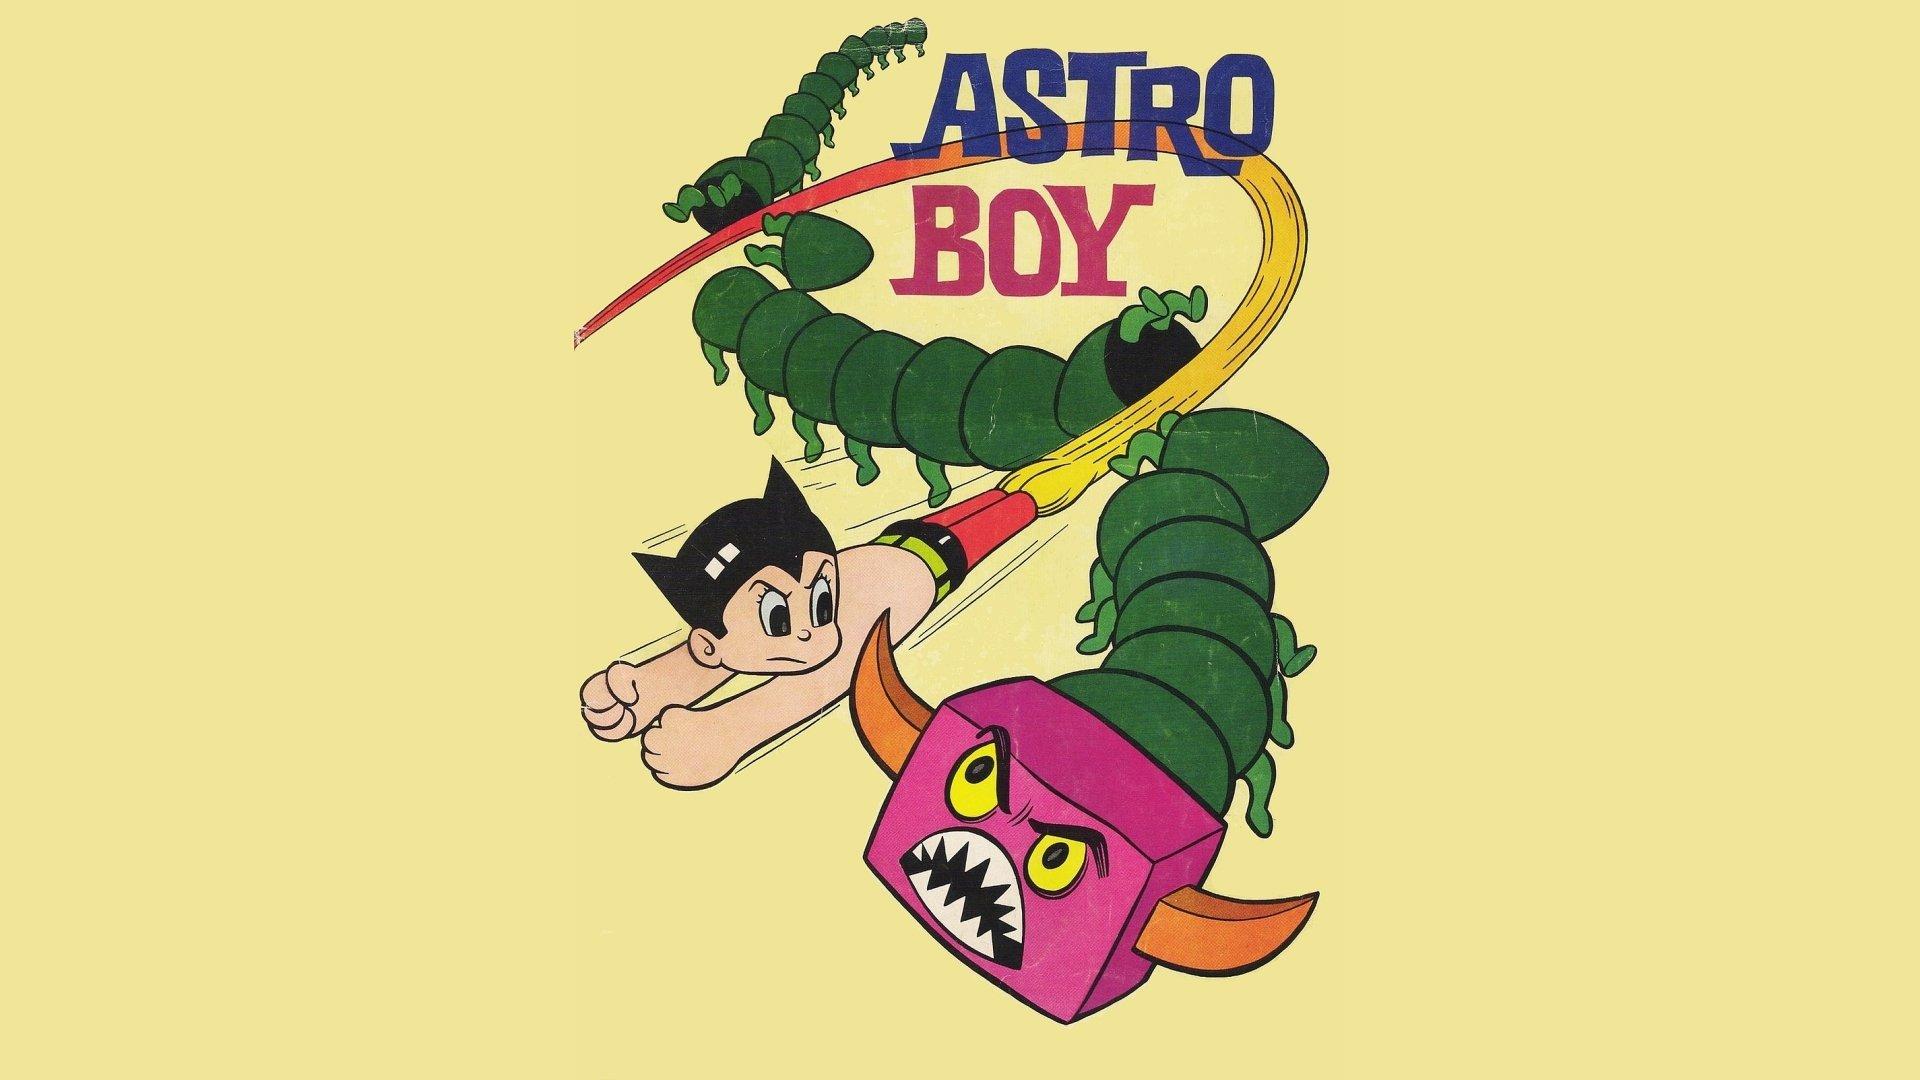 Astro Boy Hd Wallpaper Background Image 2850x1603 Id